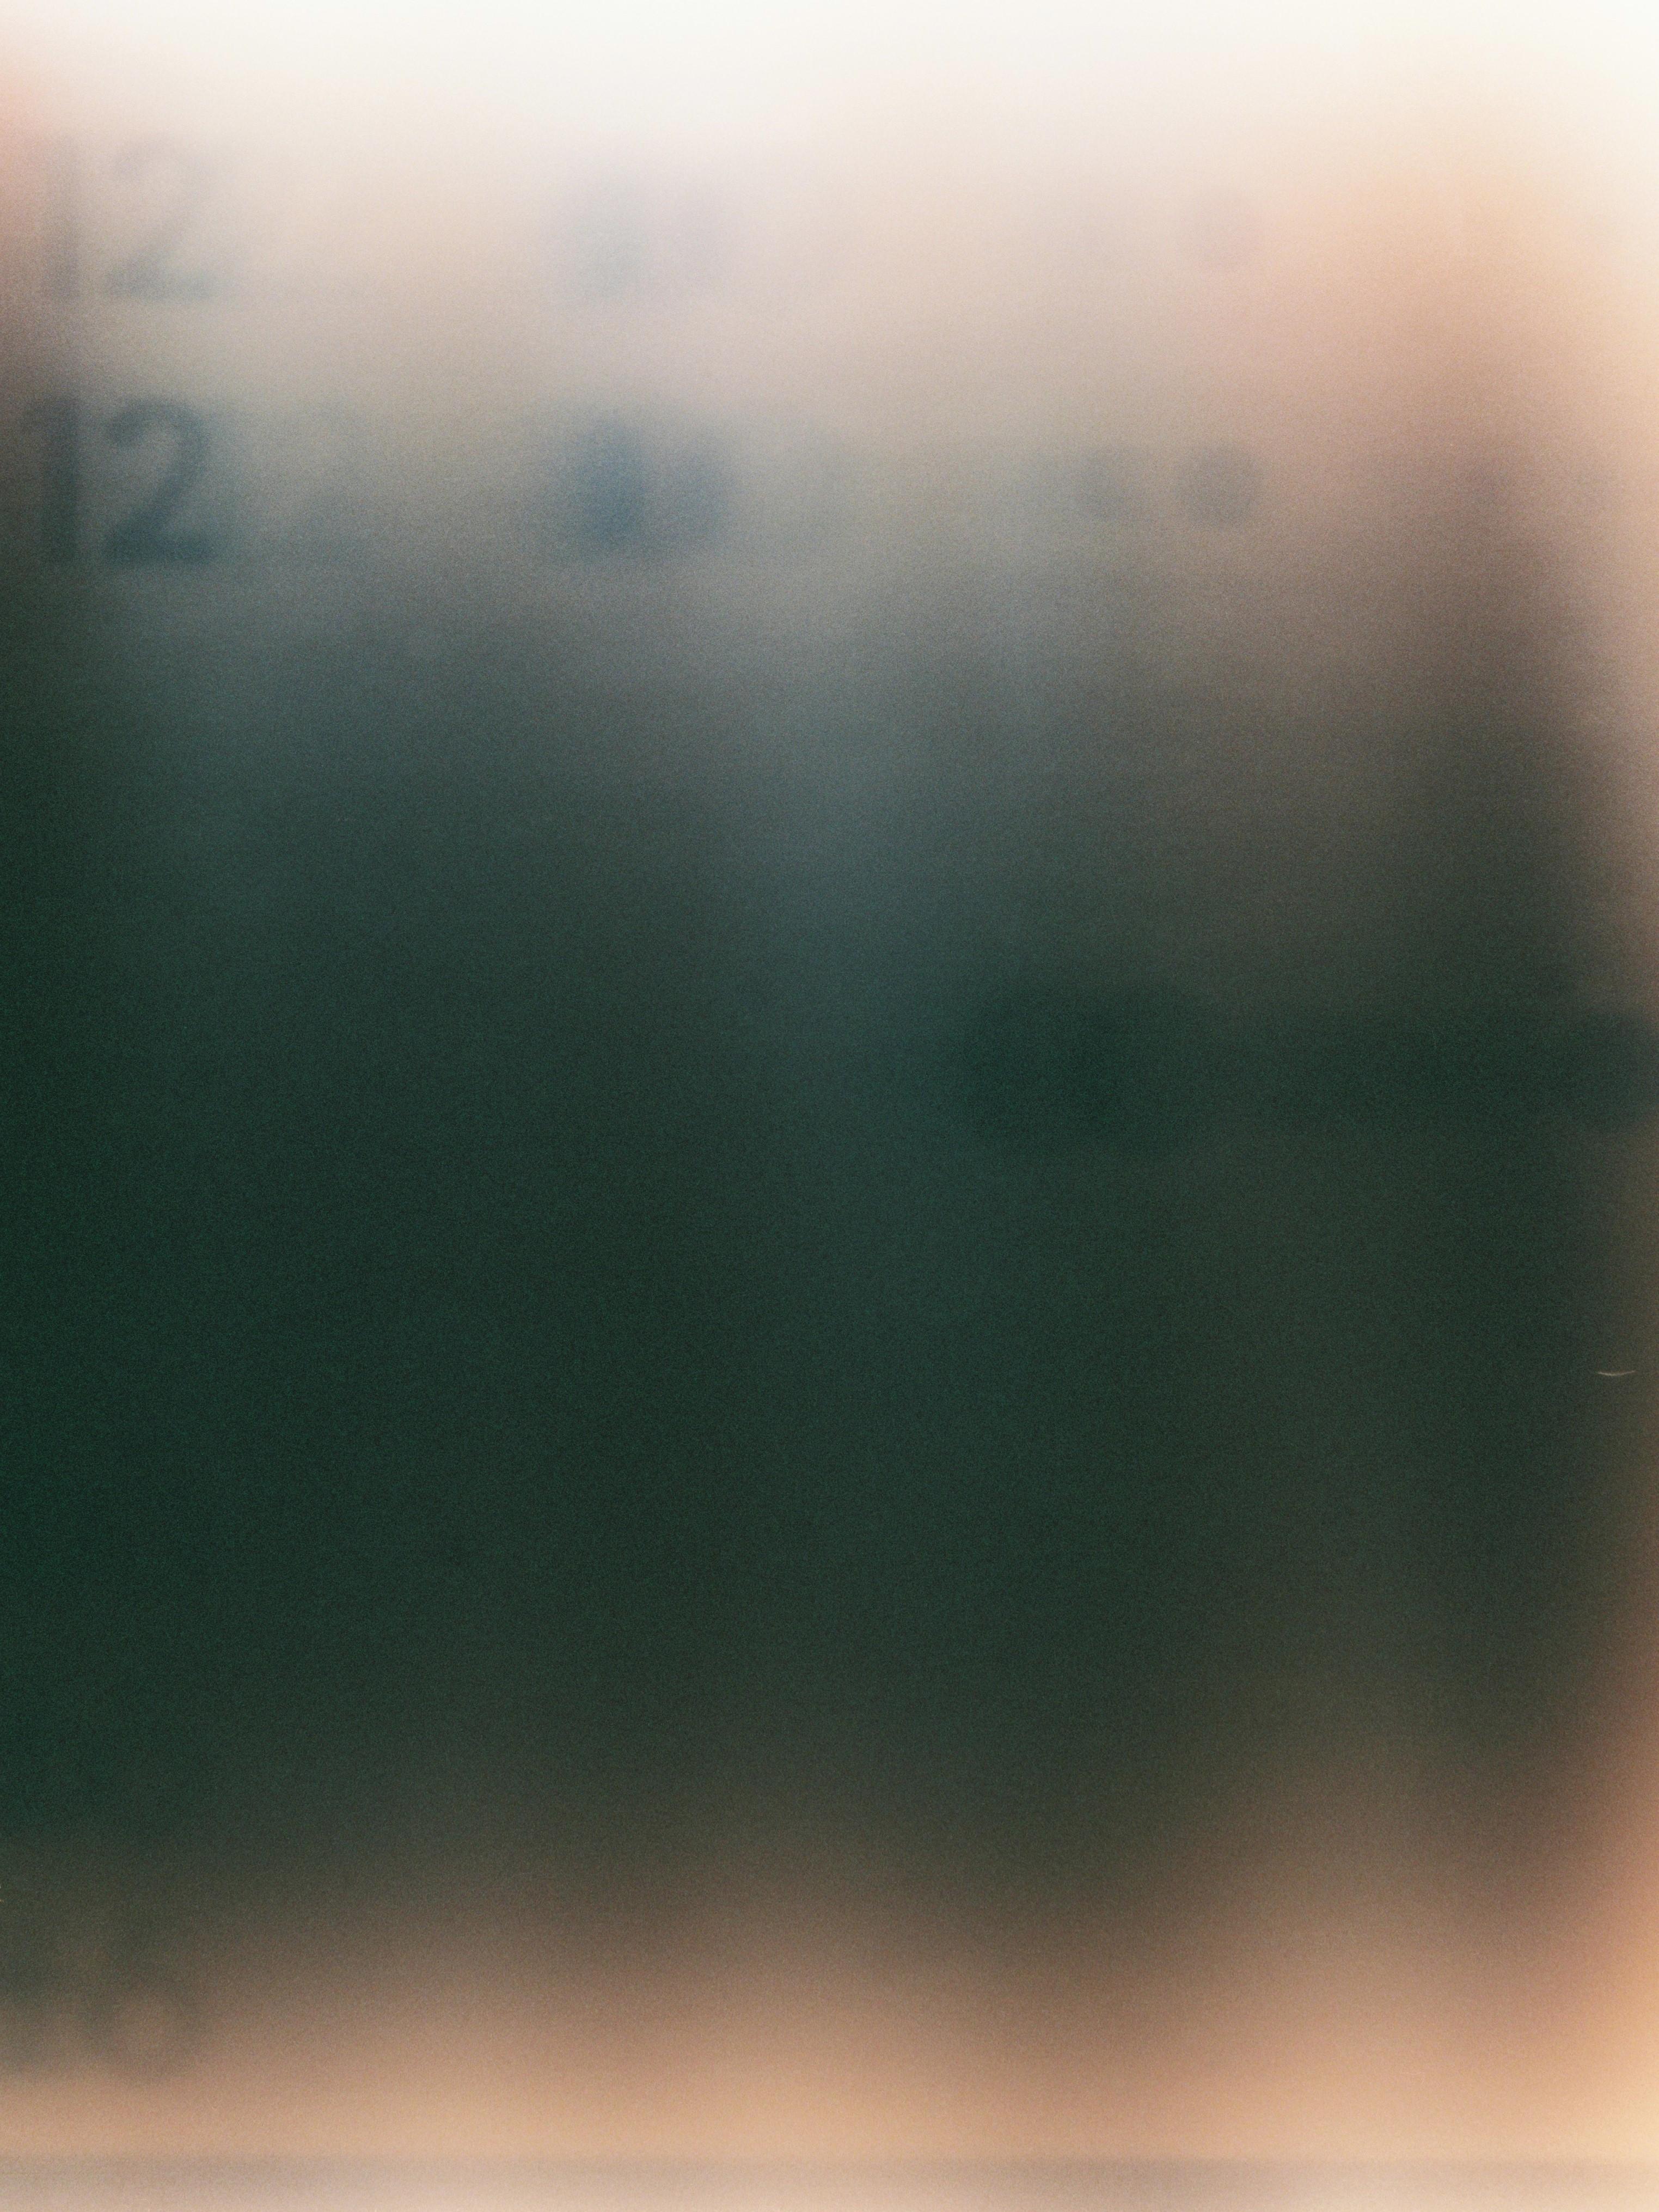 000010